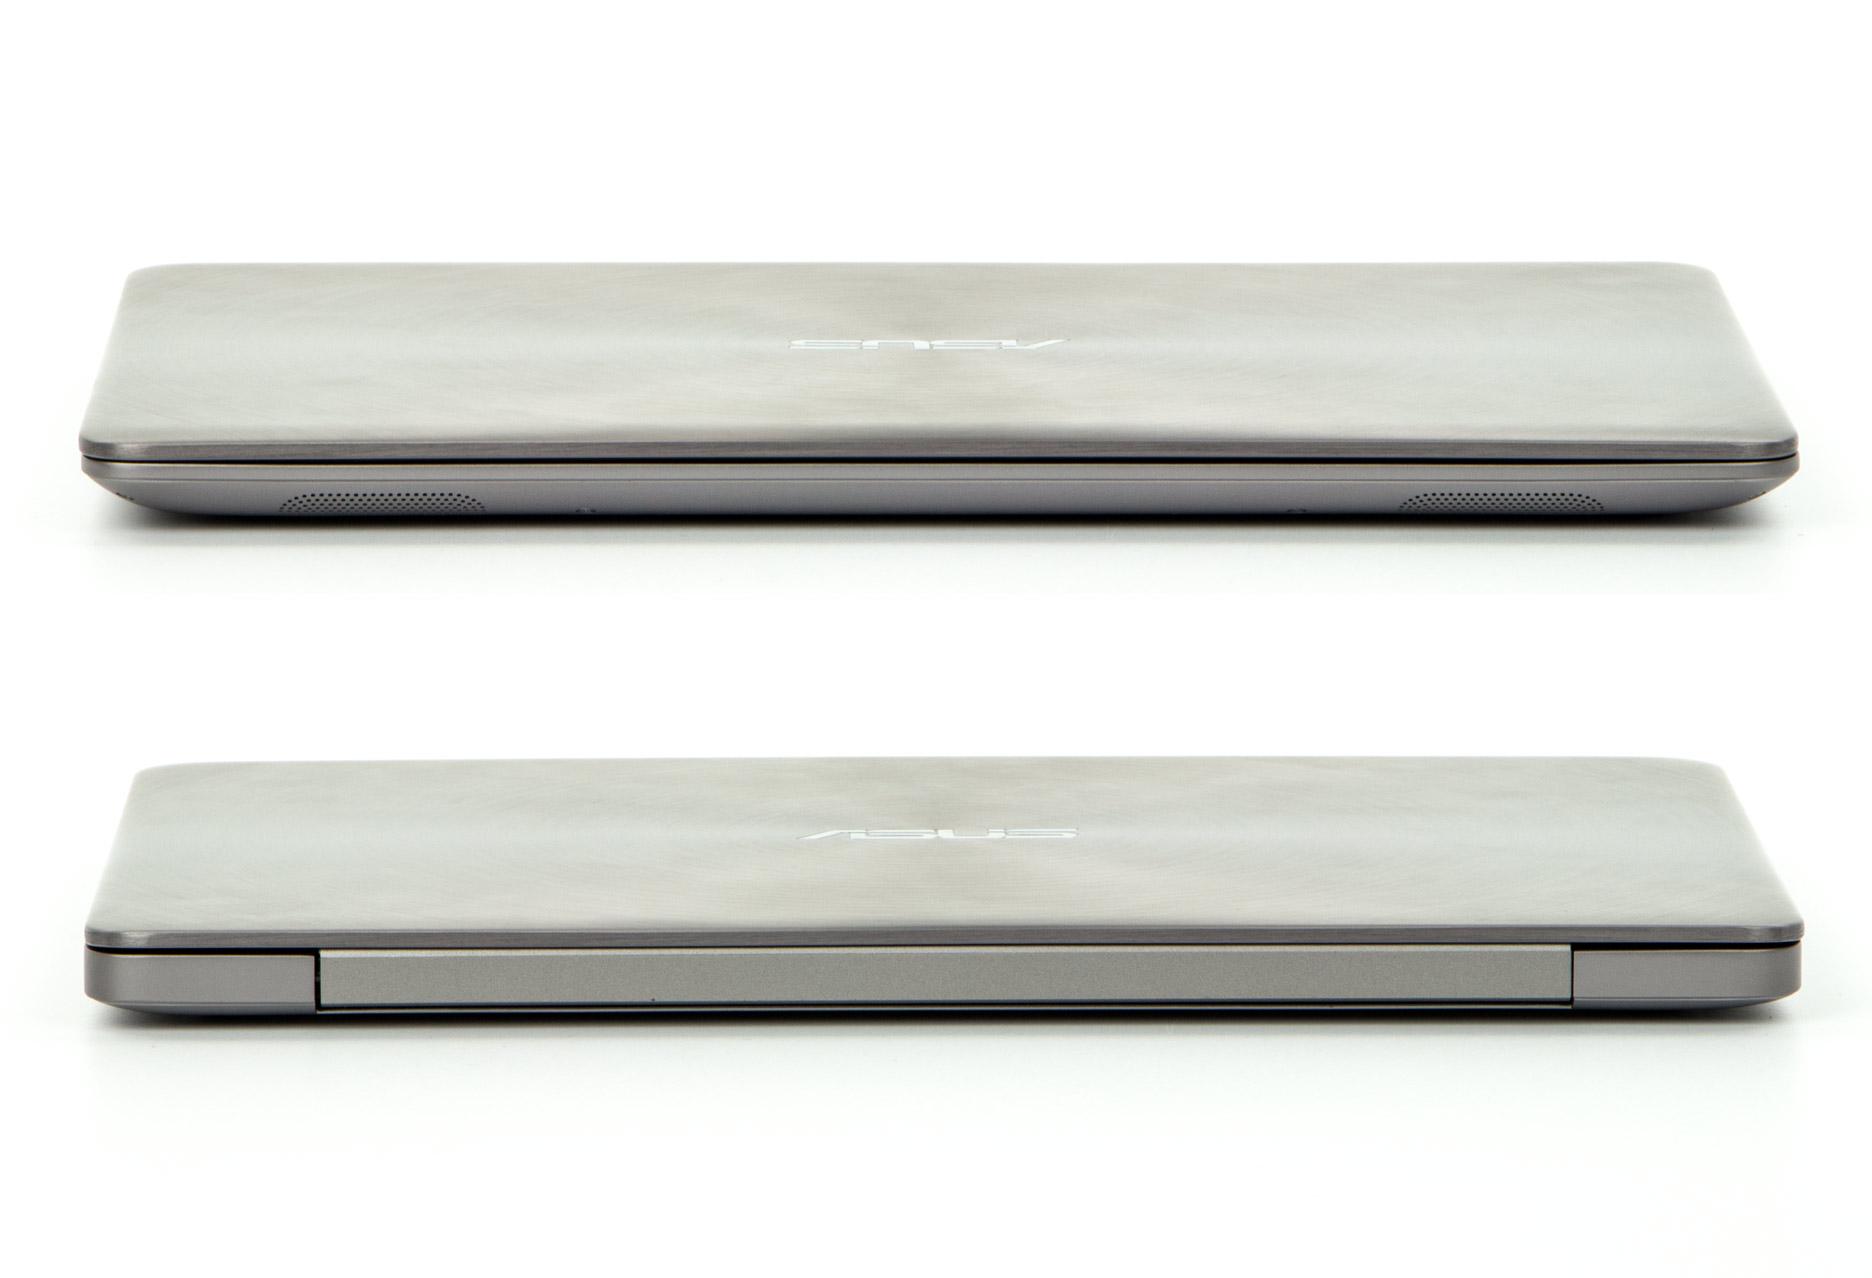 Asus Zenbook UX410UQ-GV031T przód i tył